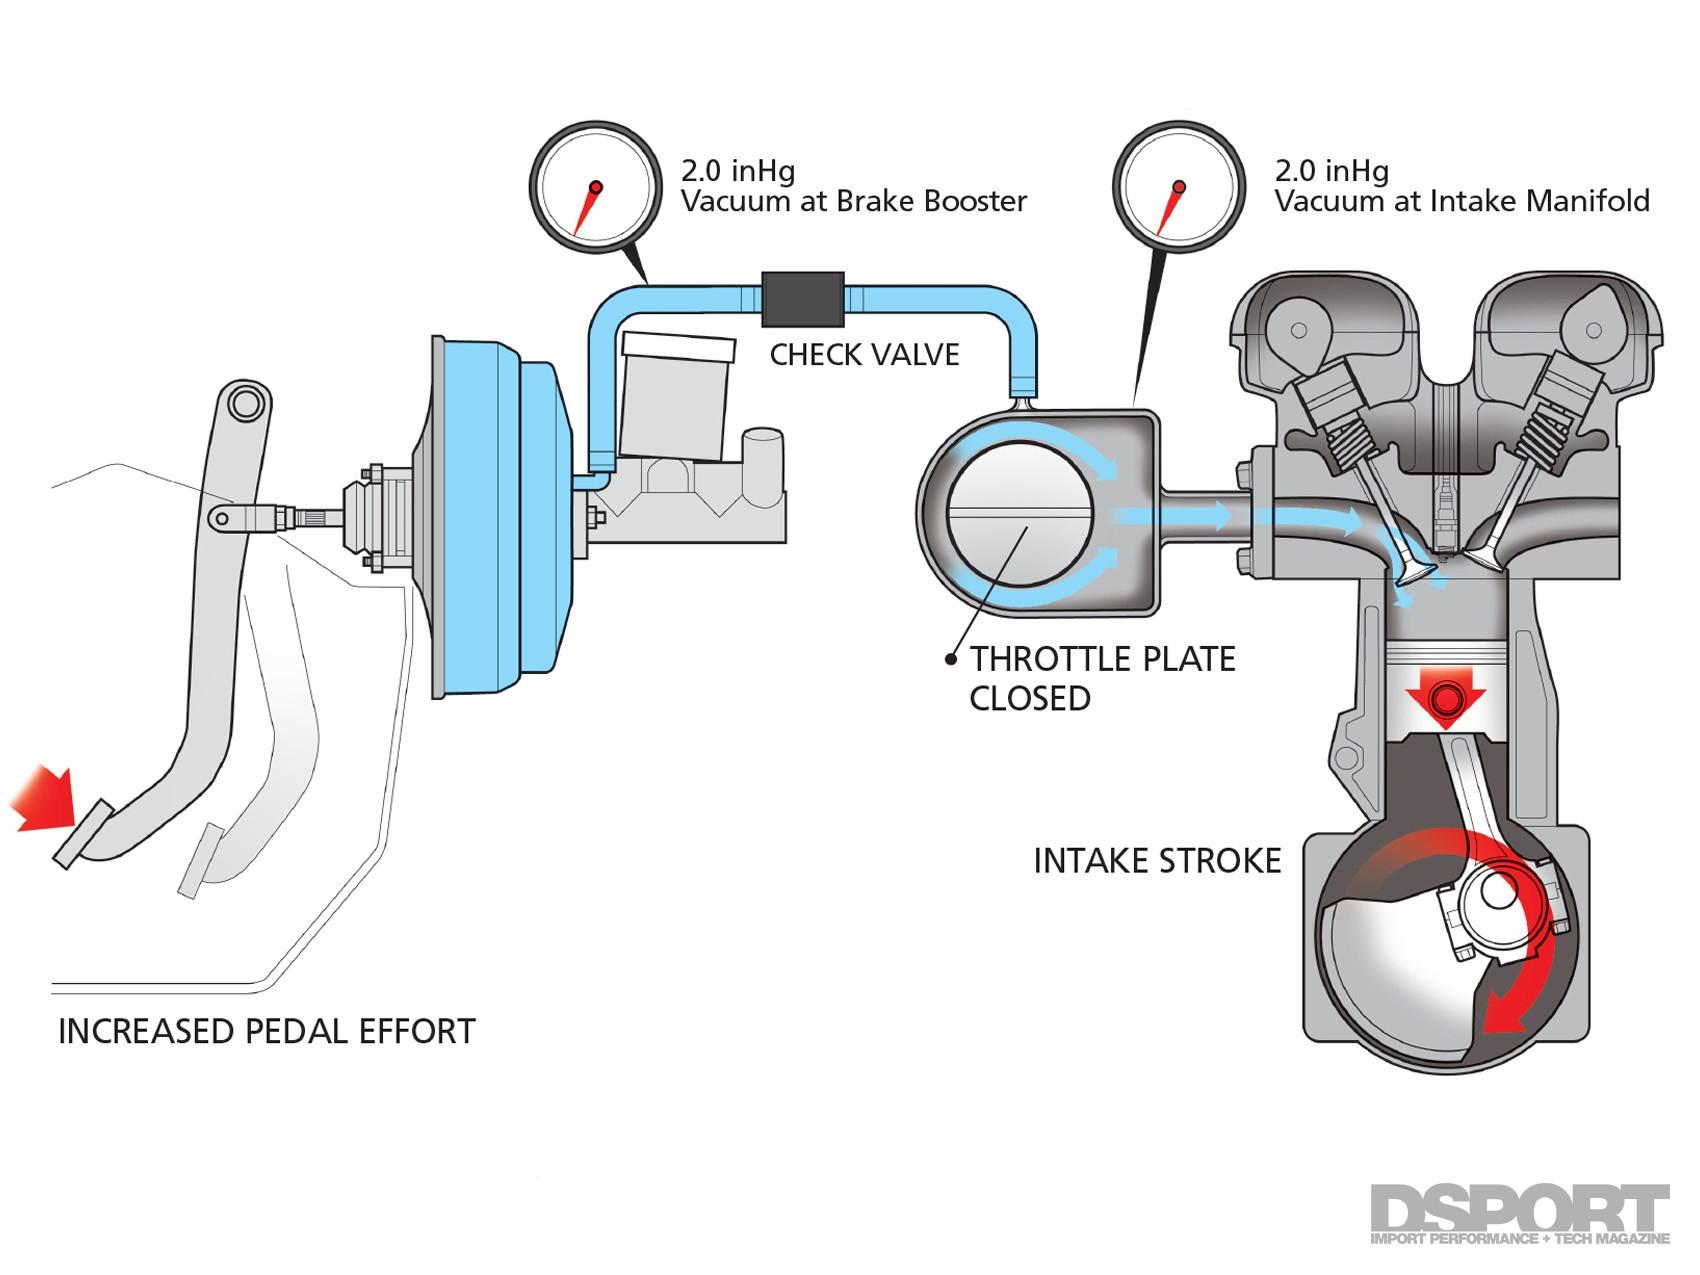 Vacuum Brake Booster Diagram P Cams Vacuum Canister Page 2 Of 3 Dsport  Magazine Of Vacuum